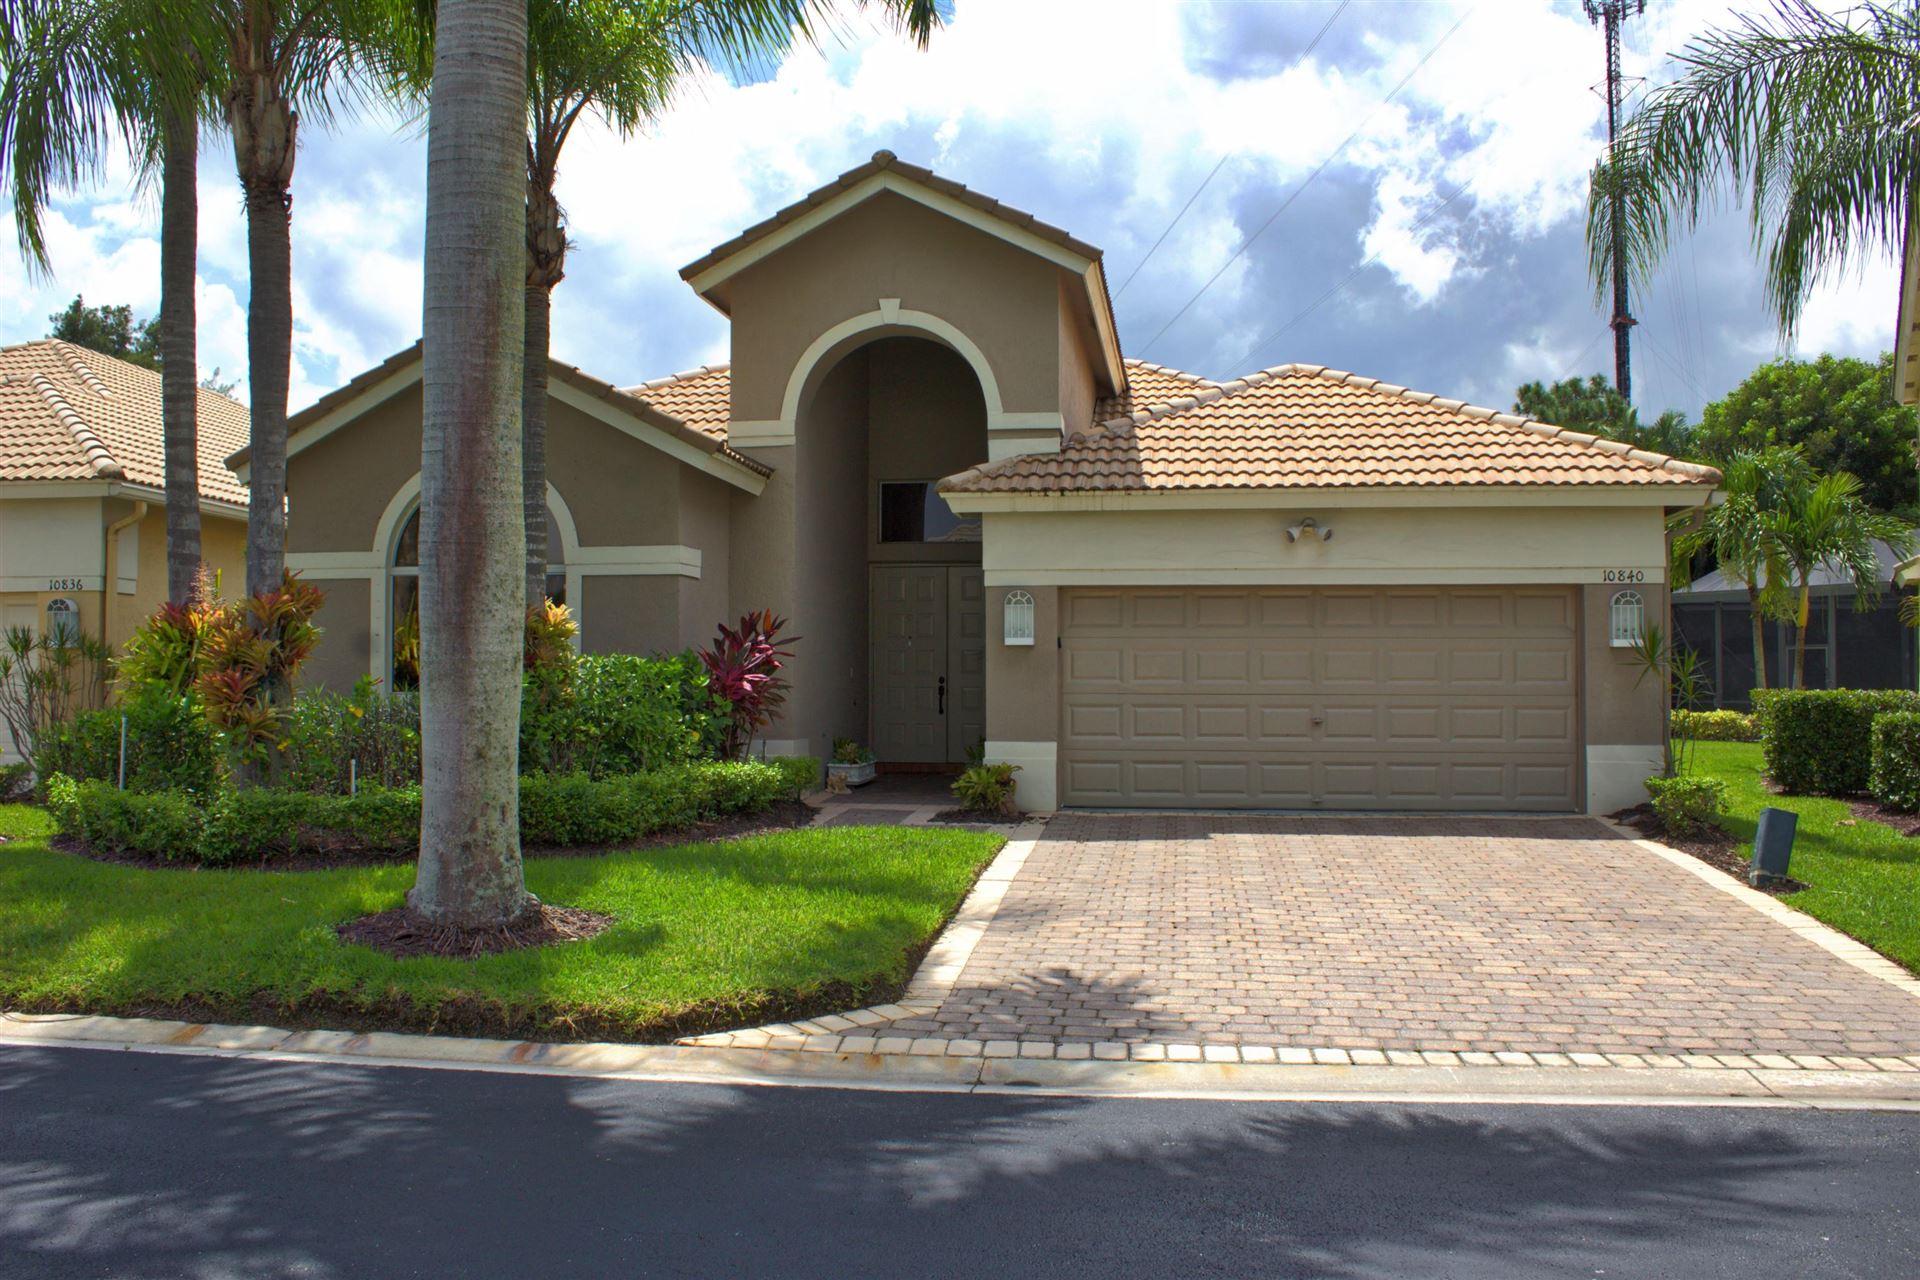 10840 Grande Boulevard, West Palm Beach, FL 33412 - #: RX-10568984